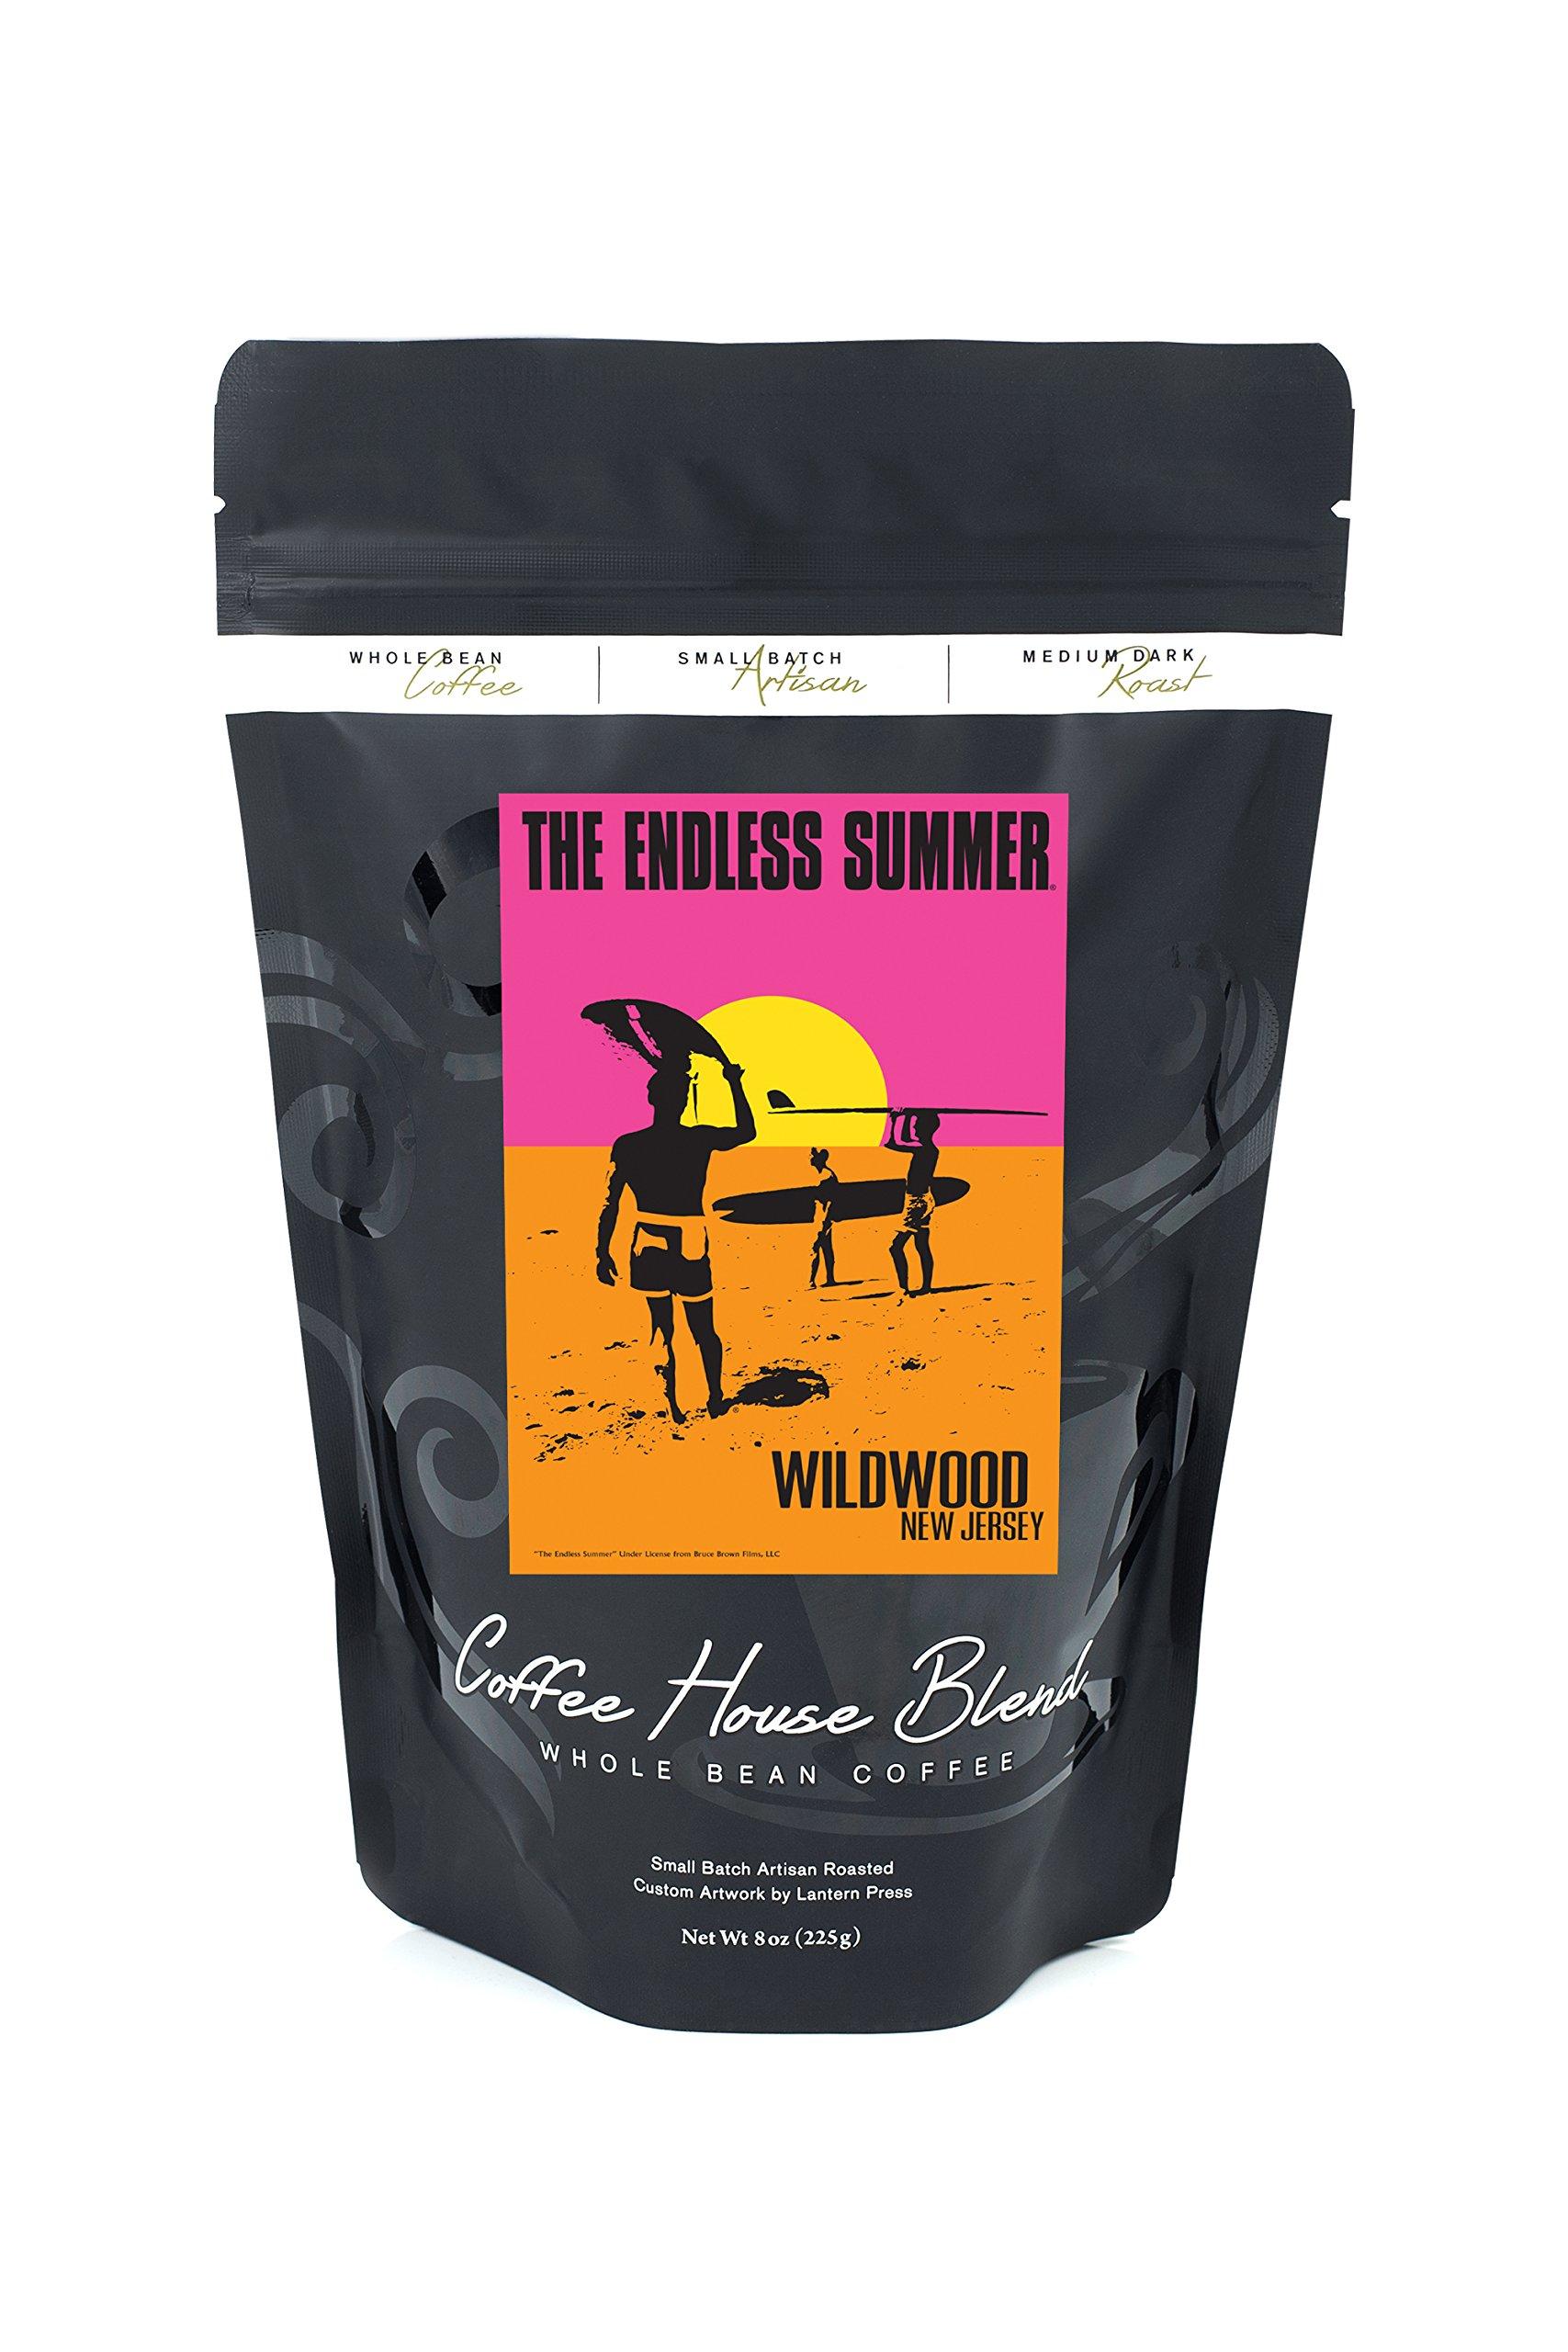 The Endless Summer - Wildwood, NJ - Original Movie Poster (8oz Whole Bean Small Batch Artisan Coffee - Bold & Strong Medium Dark Roast w/ Artwork)